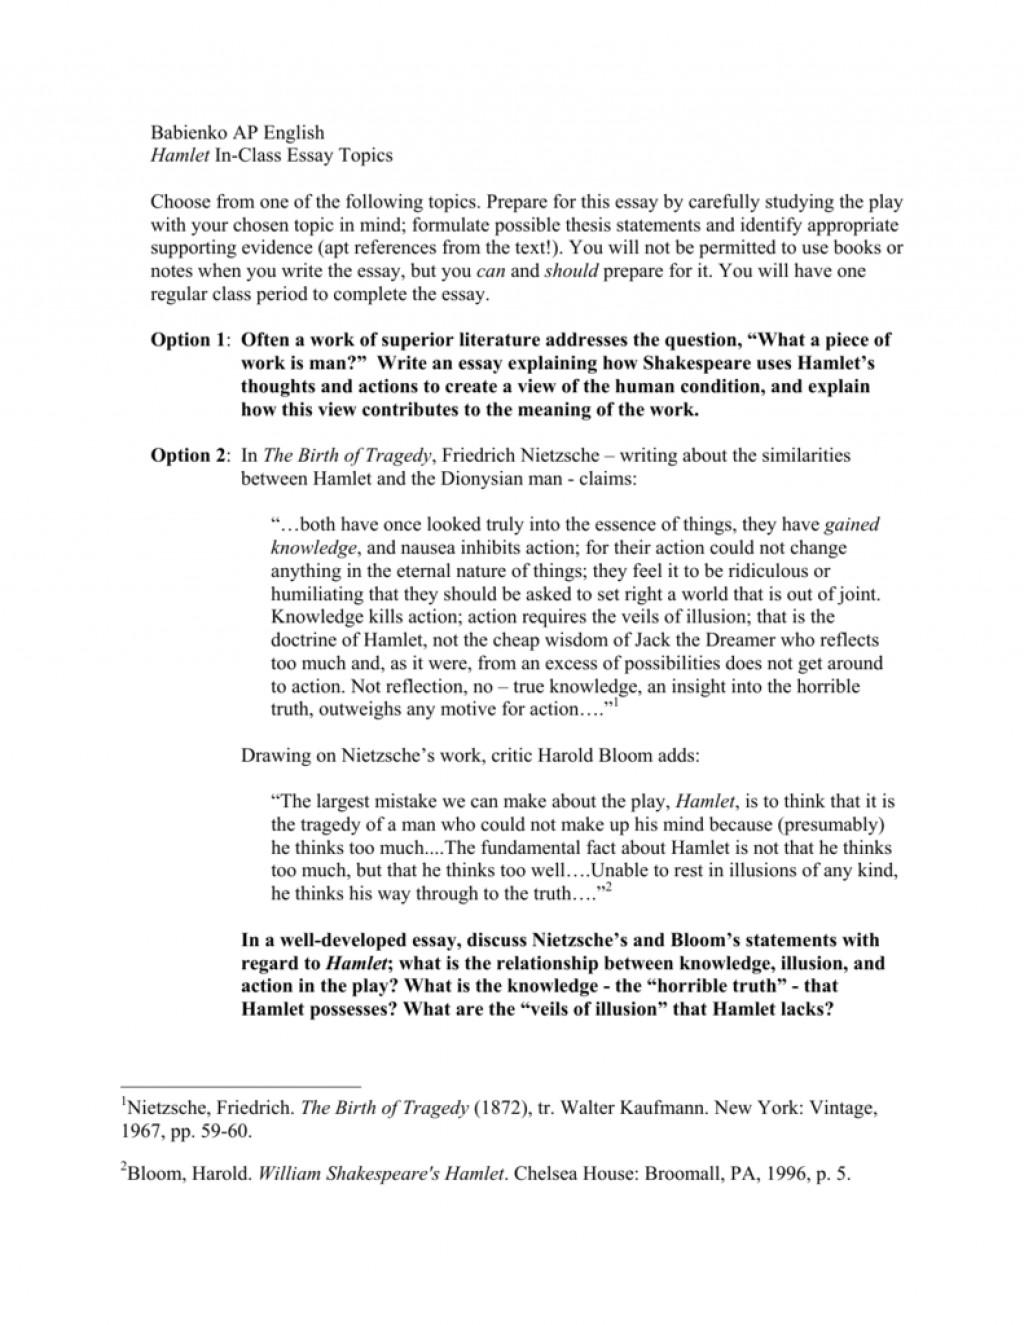 004 008676472 1 Essay Example Hamlet Rare Topics Ophelia Act Ap Literature Prompt Large